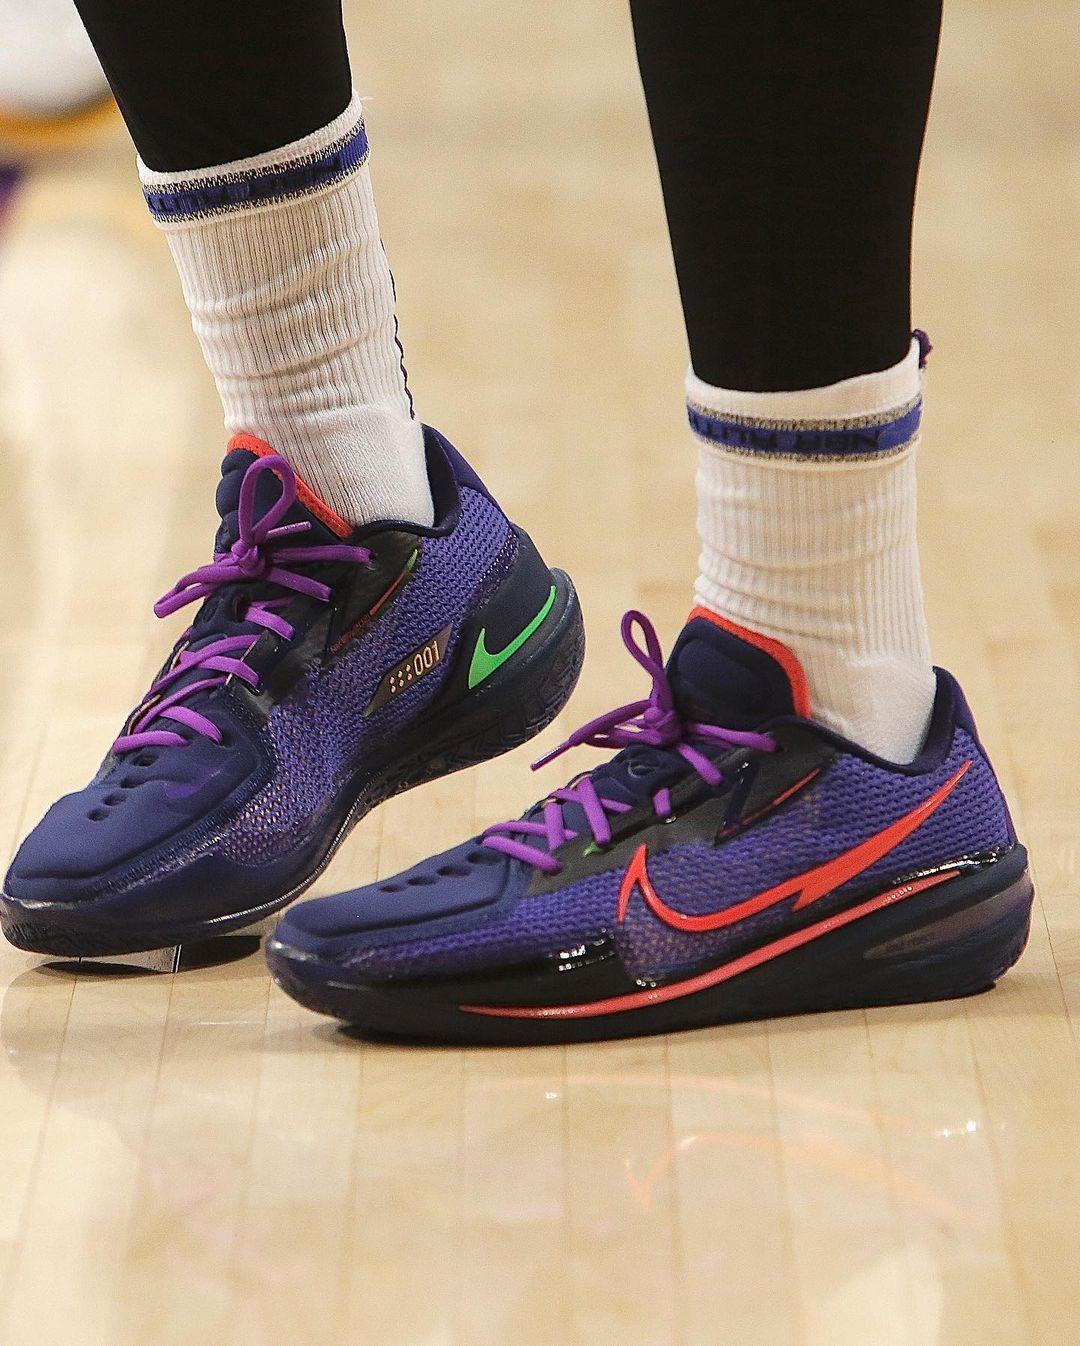 NBA,詹姆斯,PJ 塔克  ZK6 新配色看完就真香!论骚气还得看「鞋王」塔克!